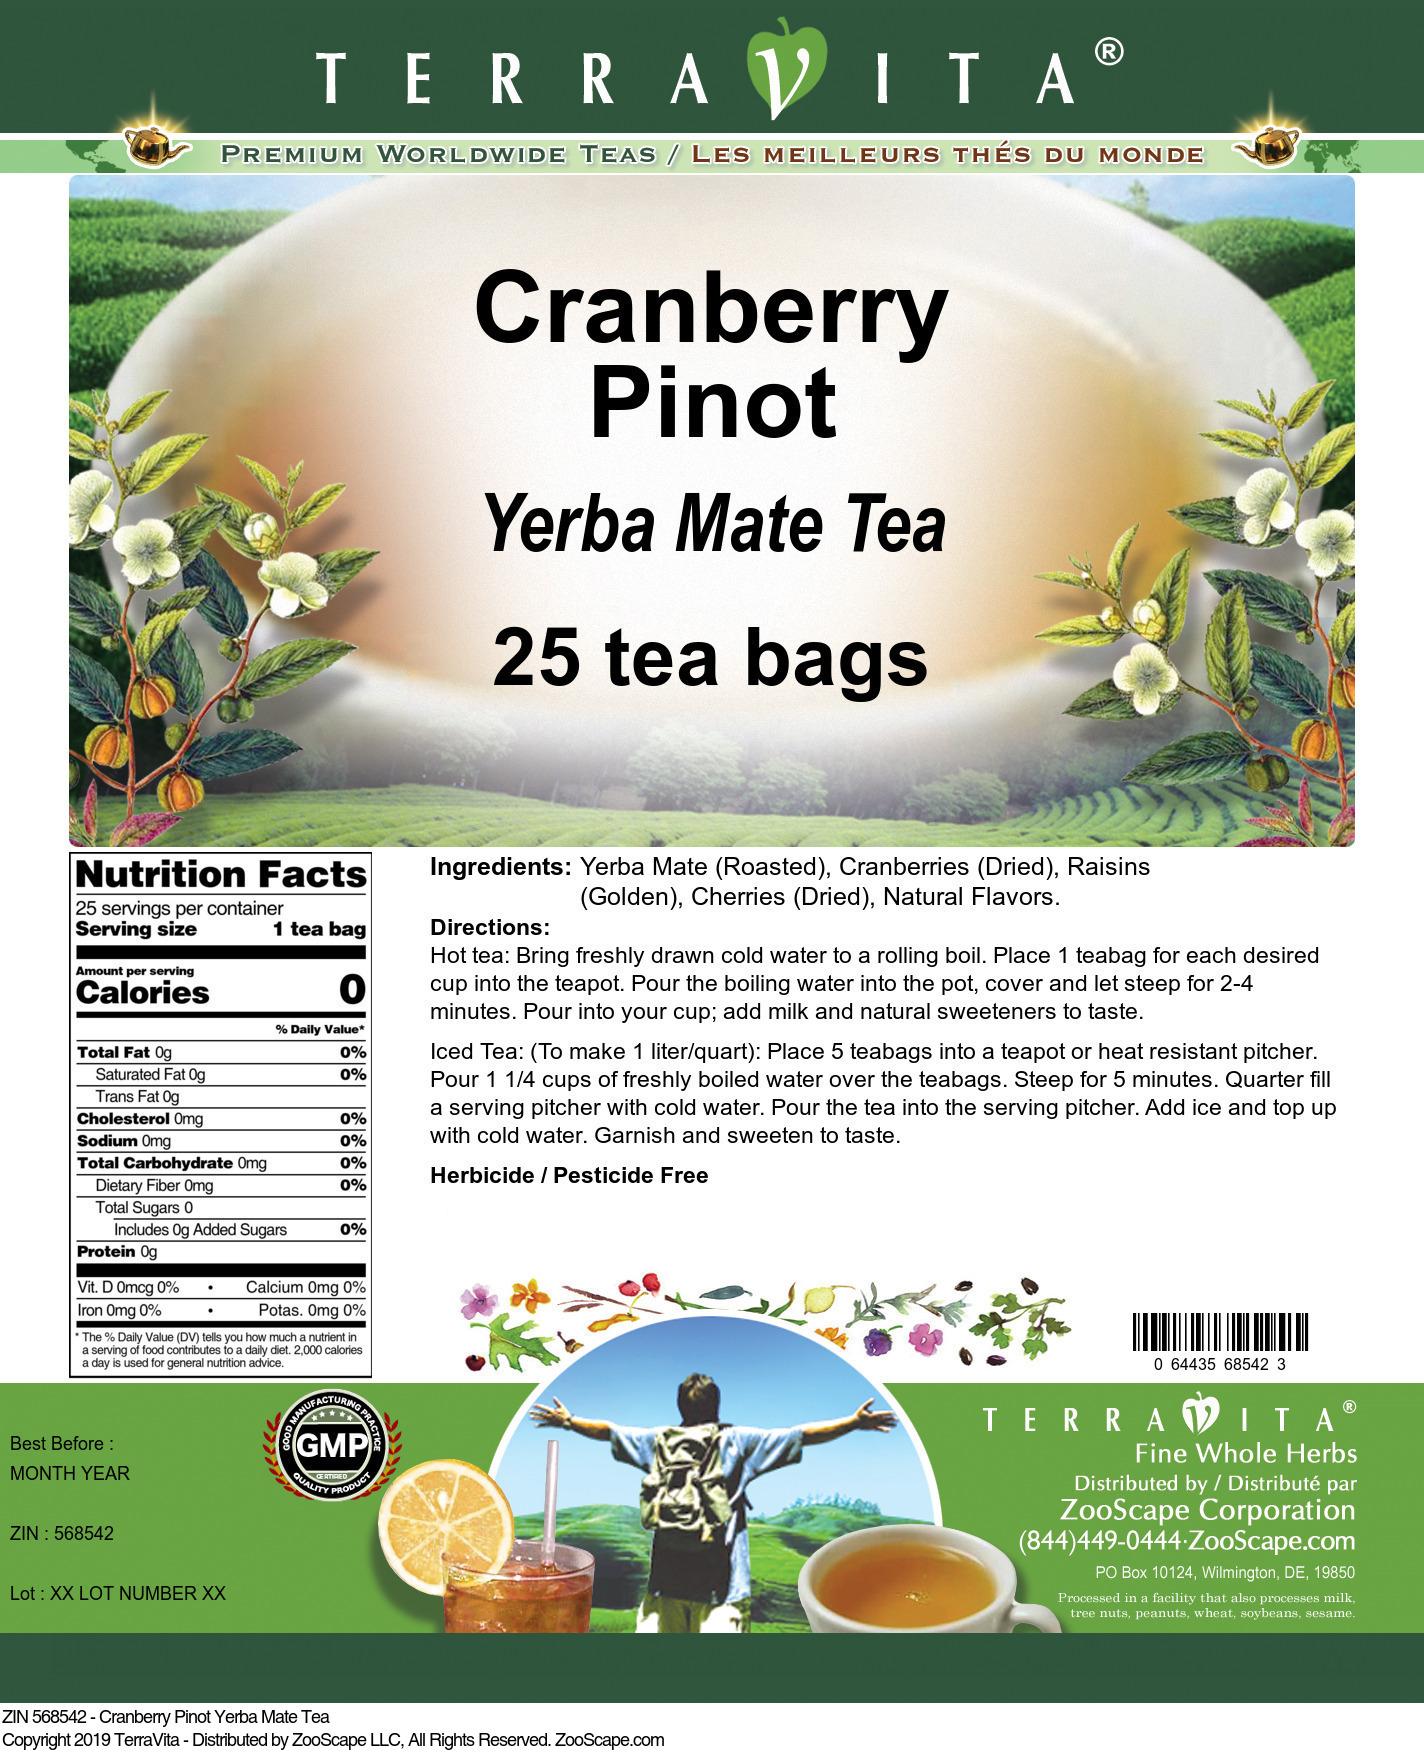 Cranberry Pinot Yerba Mate Tea